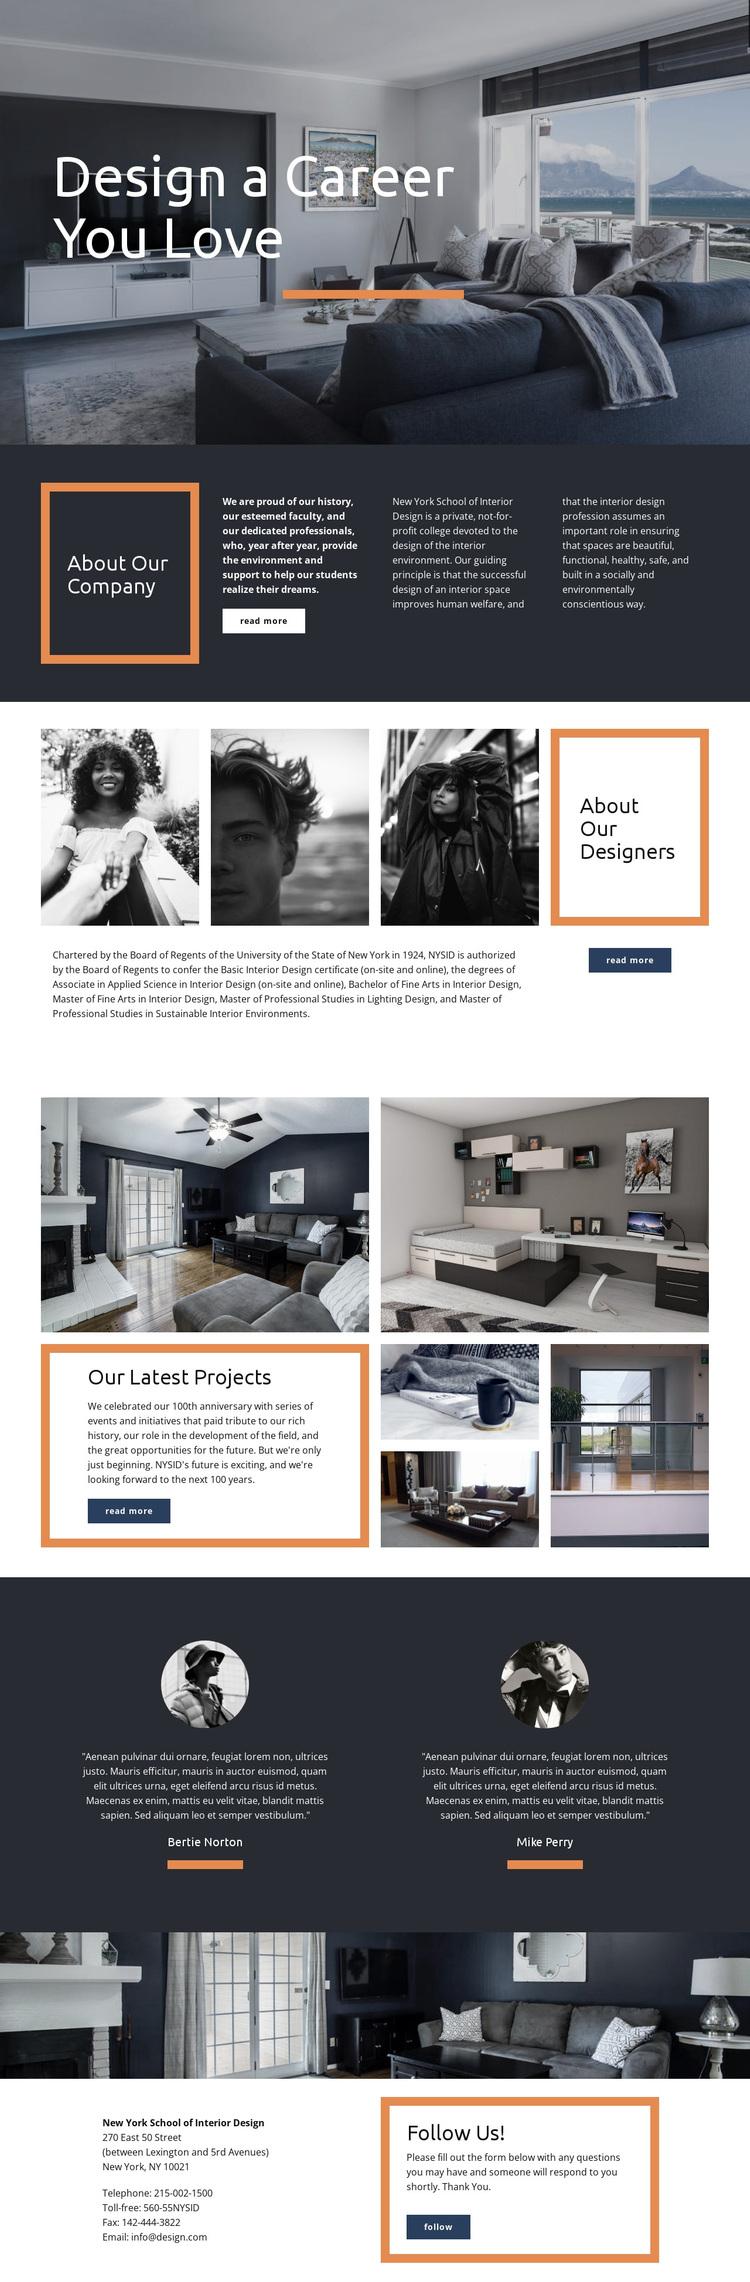 Design a Career You Love Joomla Page Builder